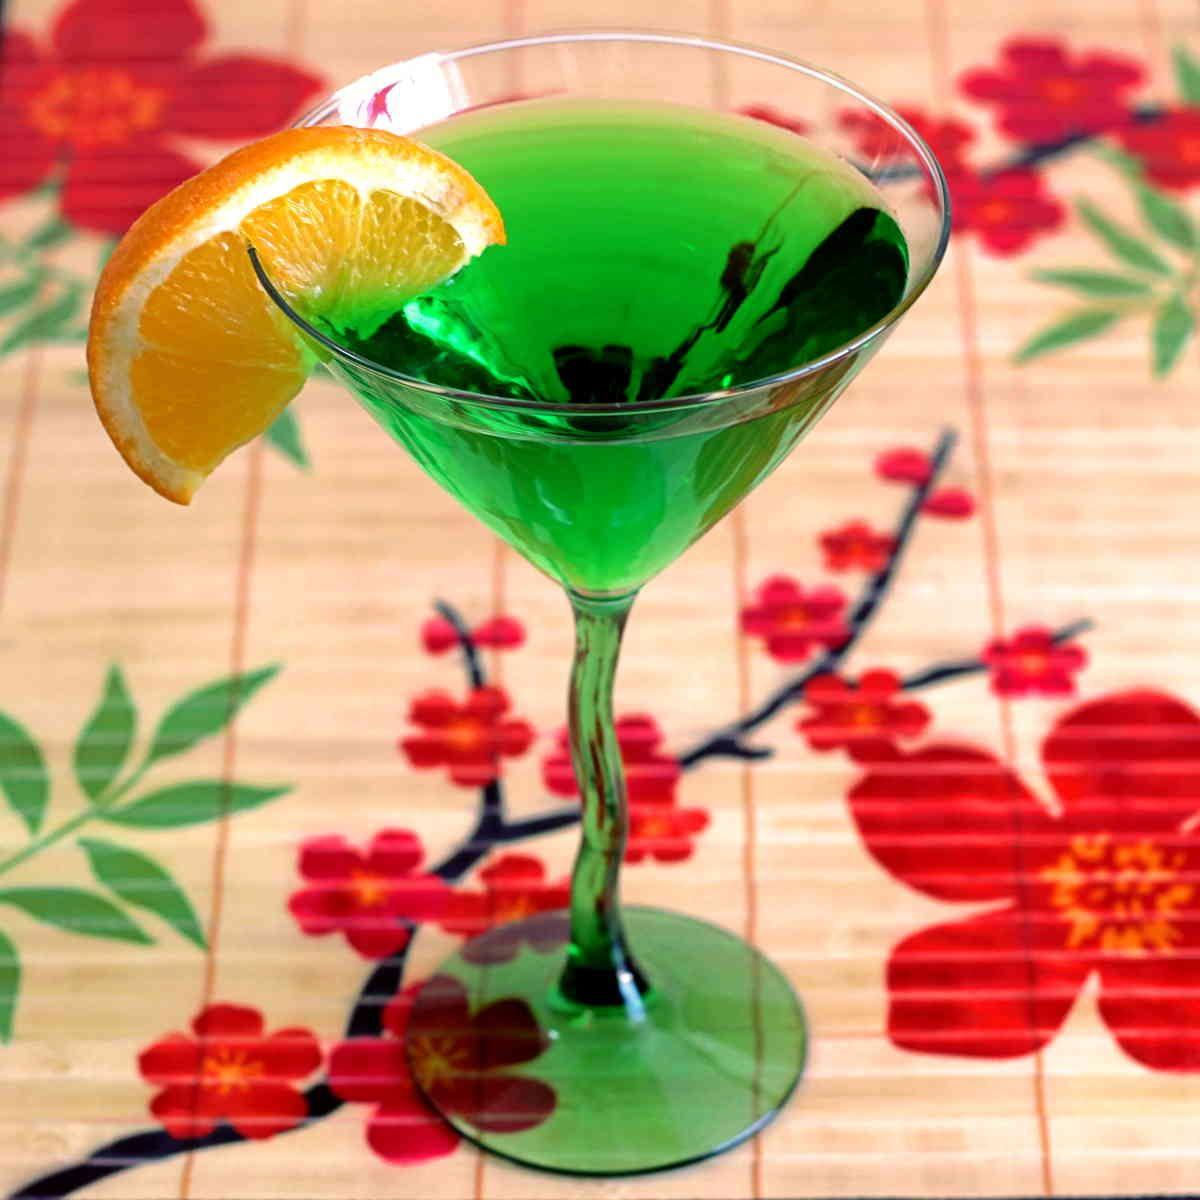 Honeydew Martini, A Midori And Vodka Drink Recipe